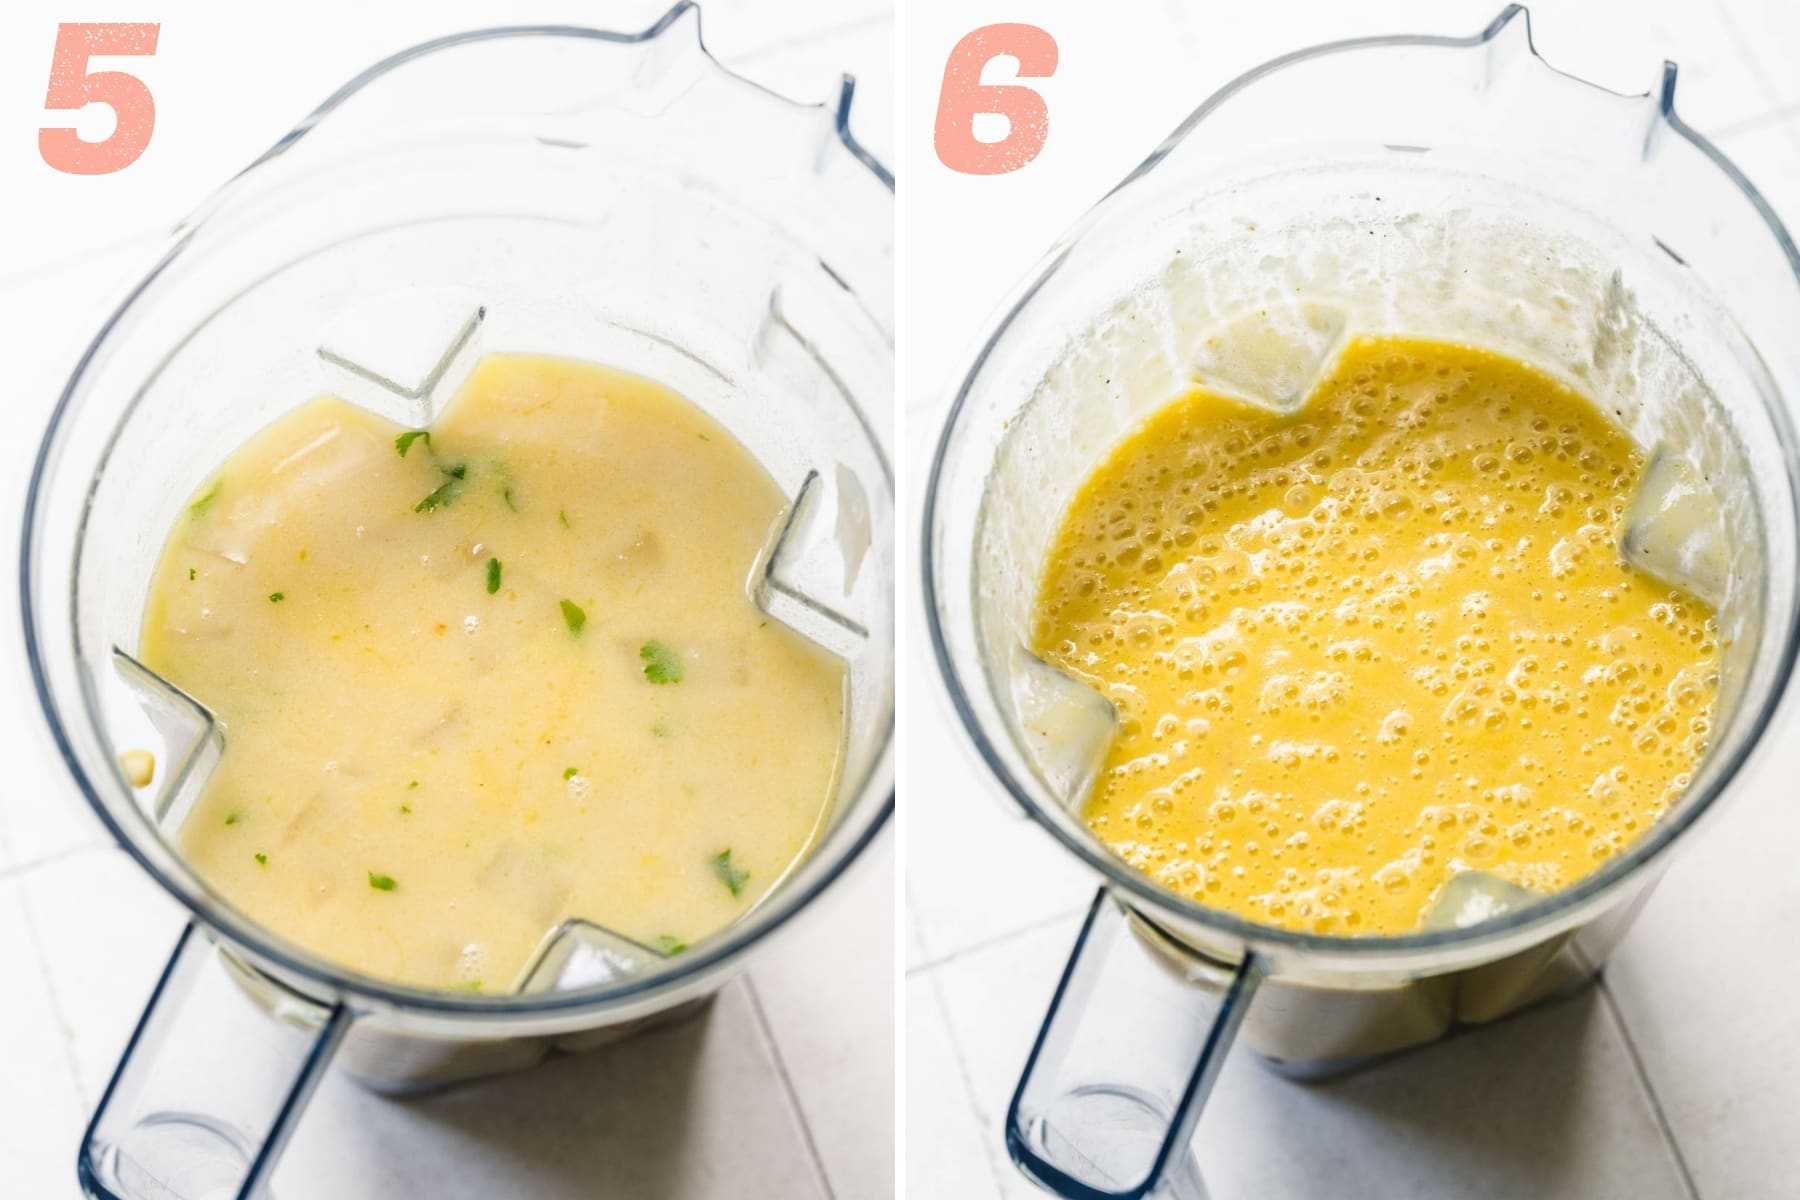 before and after blending vegan corn chowder in blender.